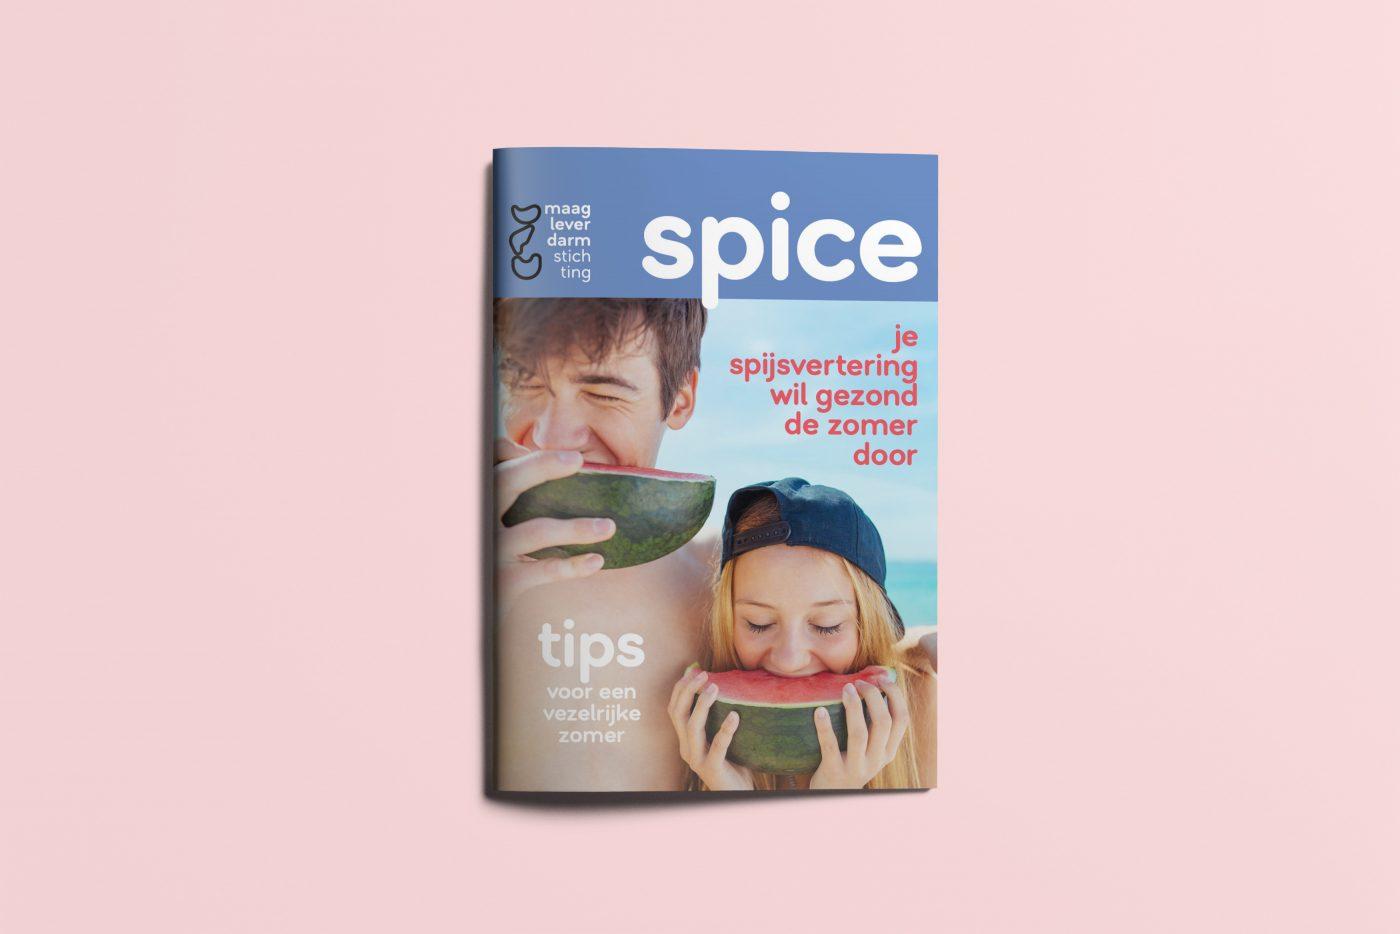 https://www.mlds.nl/content/uploads/MLDS_Spice-zomer-mockup.jpg